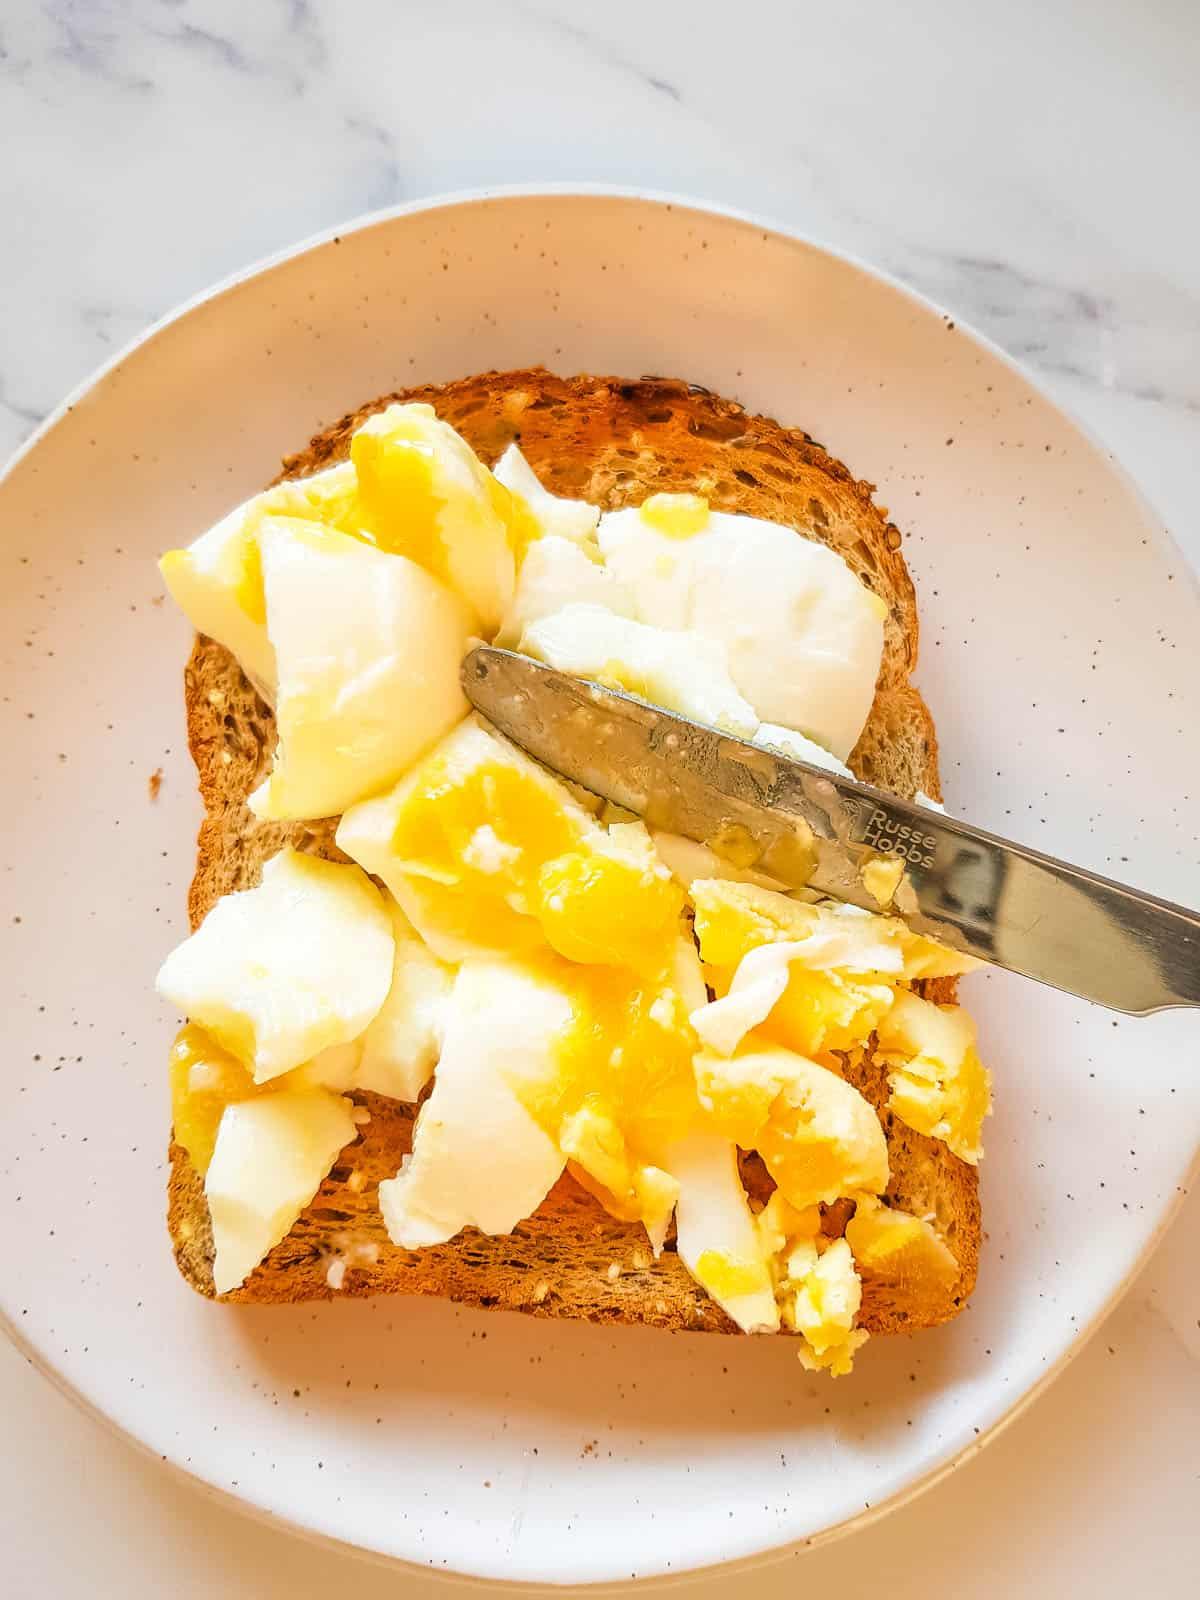 Smashing an egg on toast.